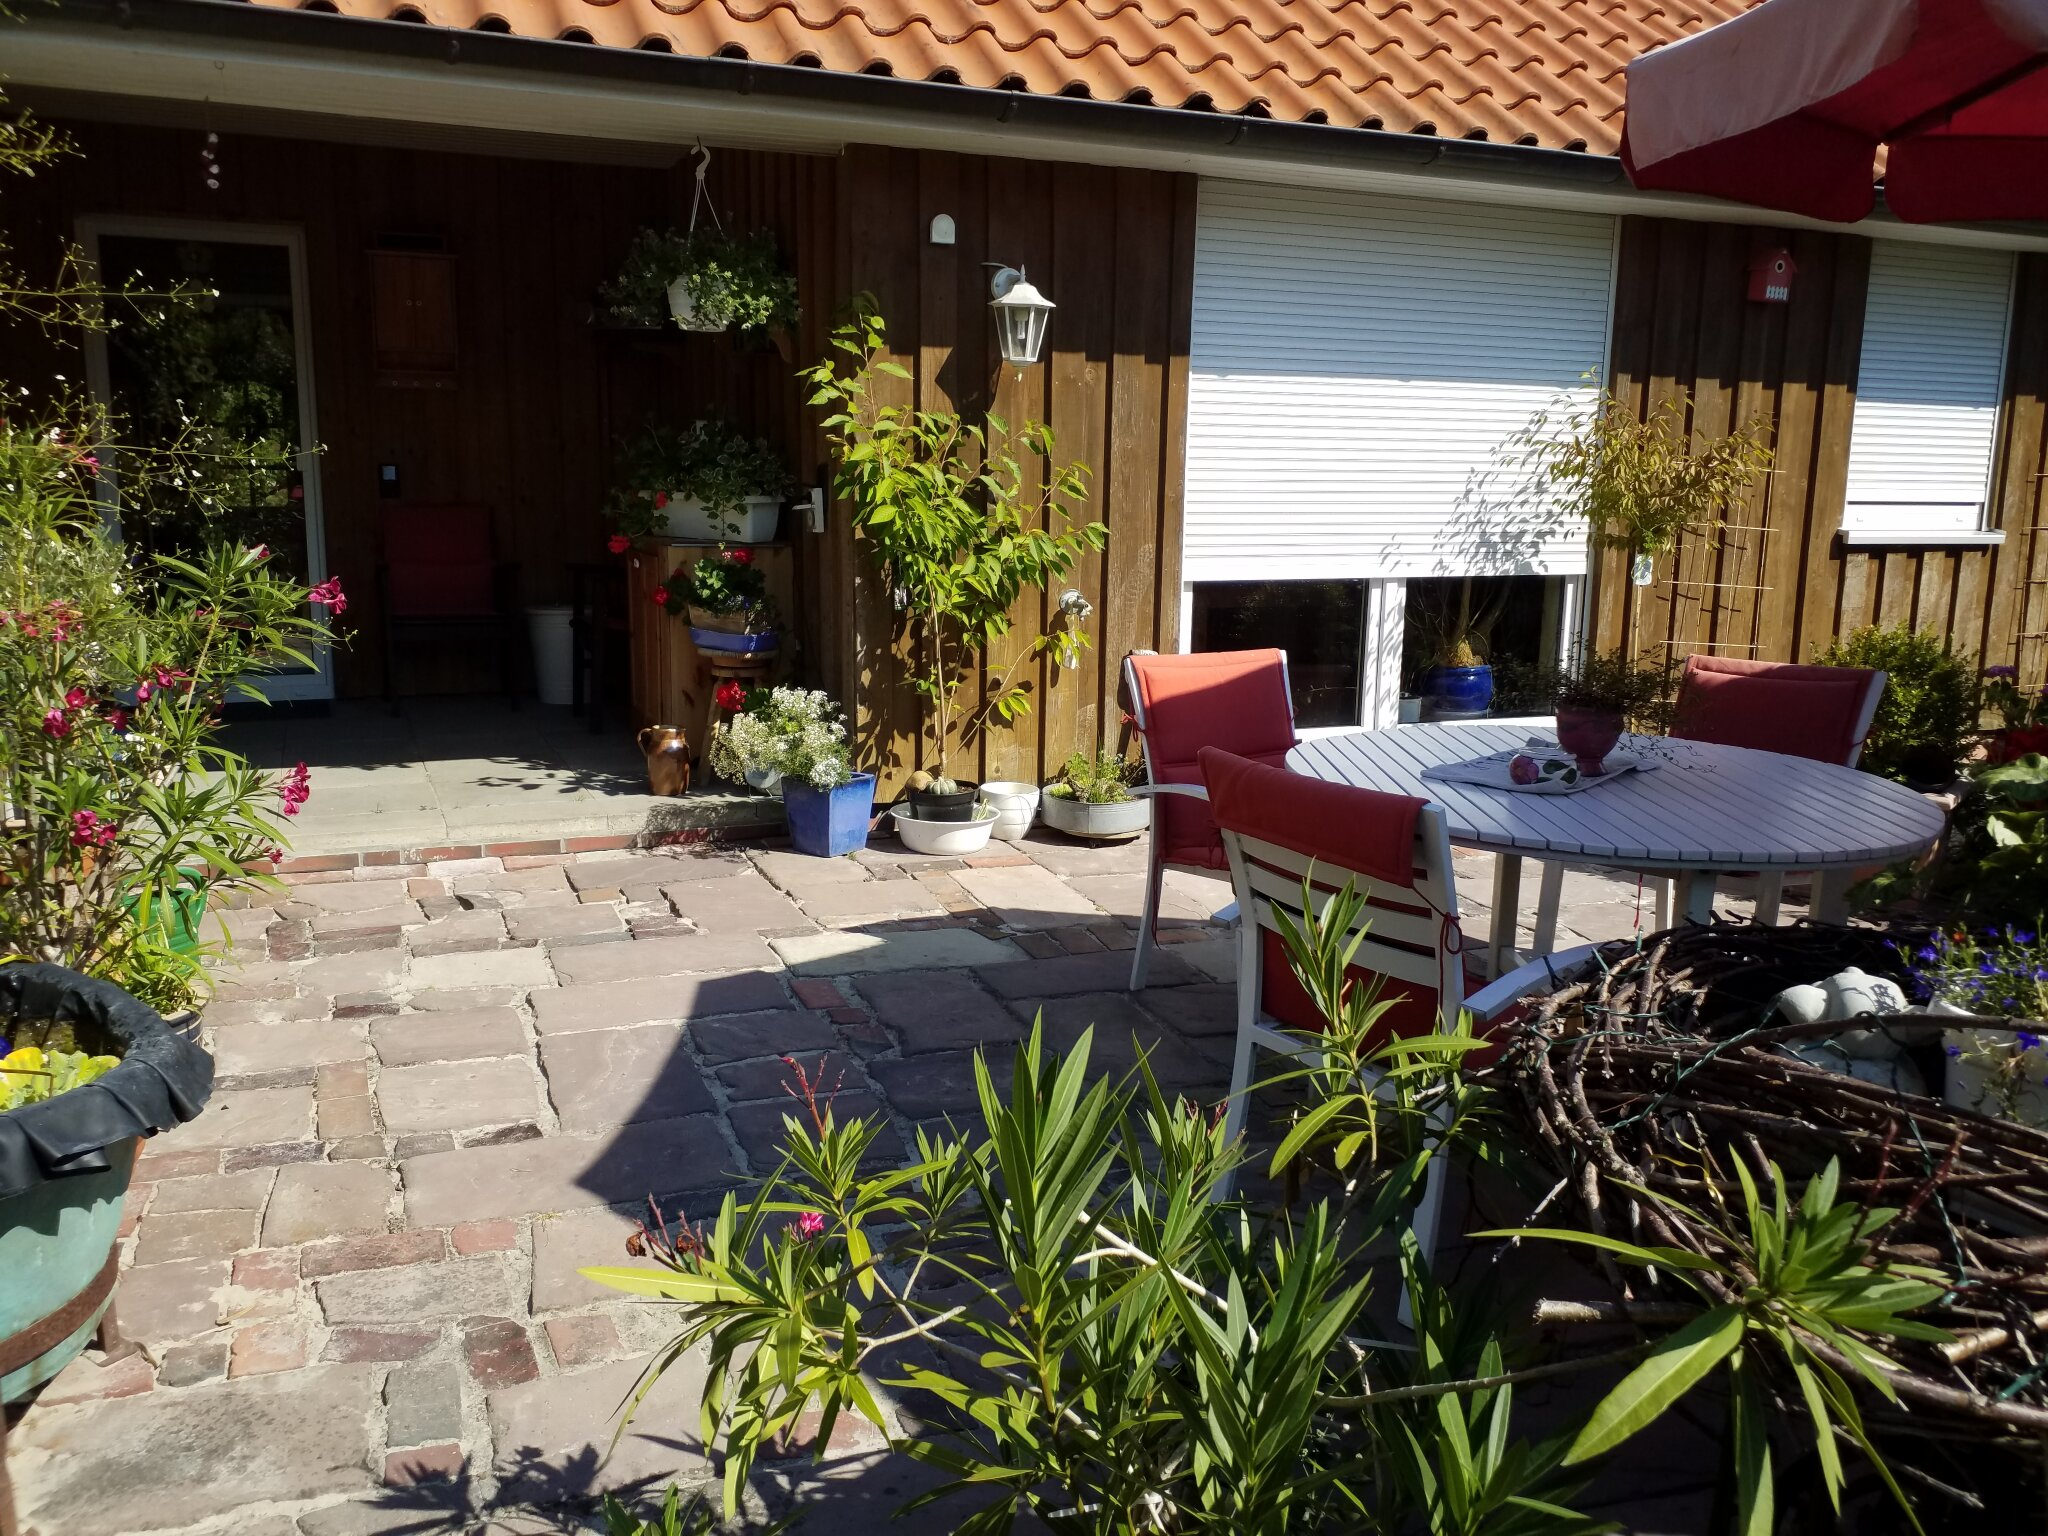 Strand bei Flut _ Eckwarderh�rne 0816